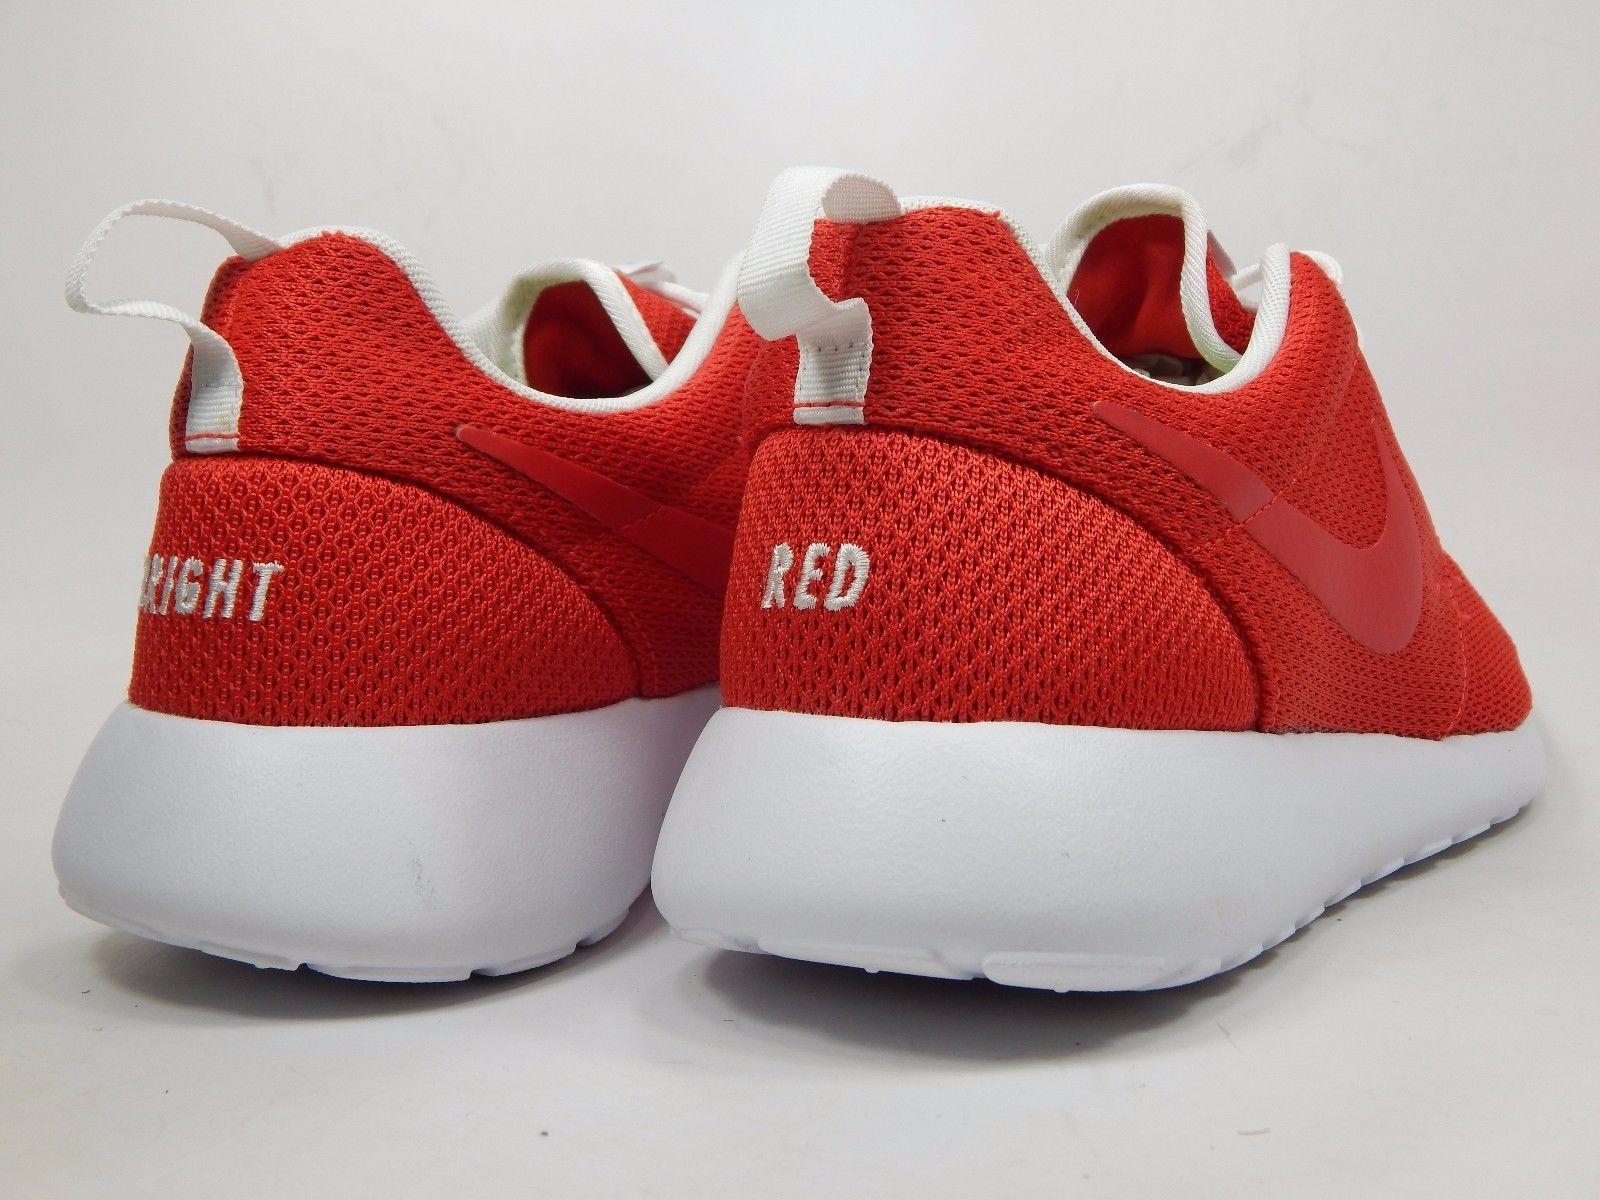 2cf2f9285076 Nike Rosherun iD Bright Red Men s Running Shoes Size 11 M (D) EU ...